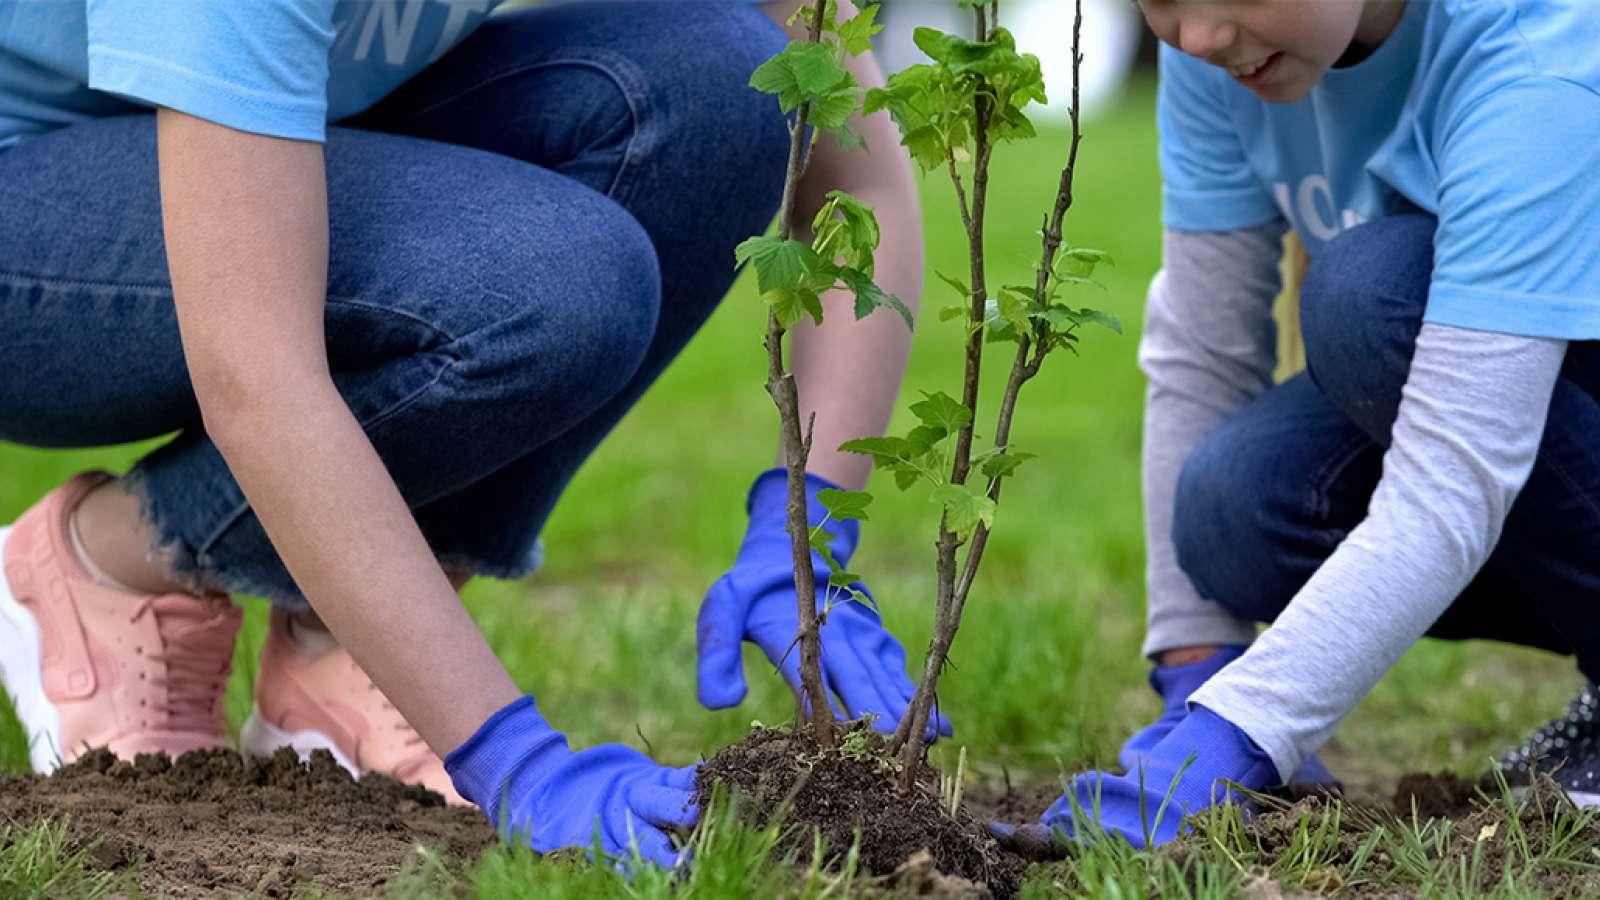 People planting trees